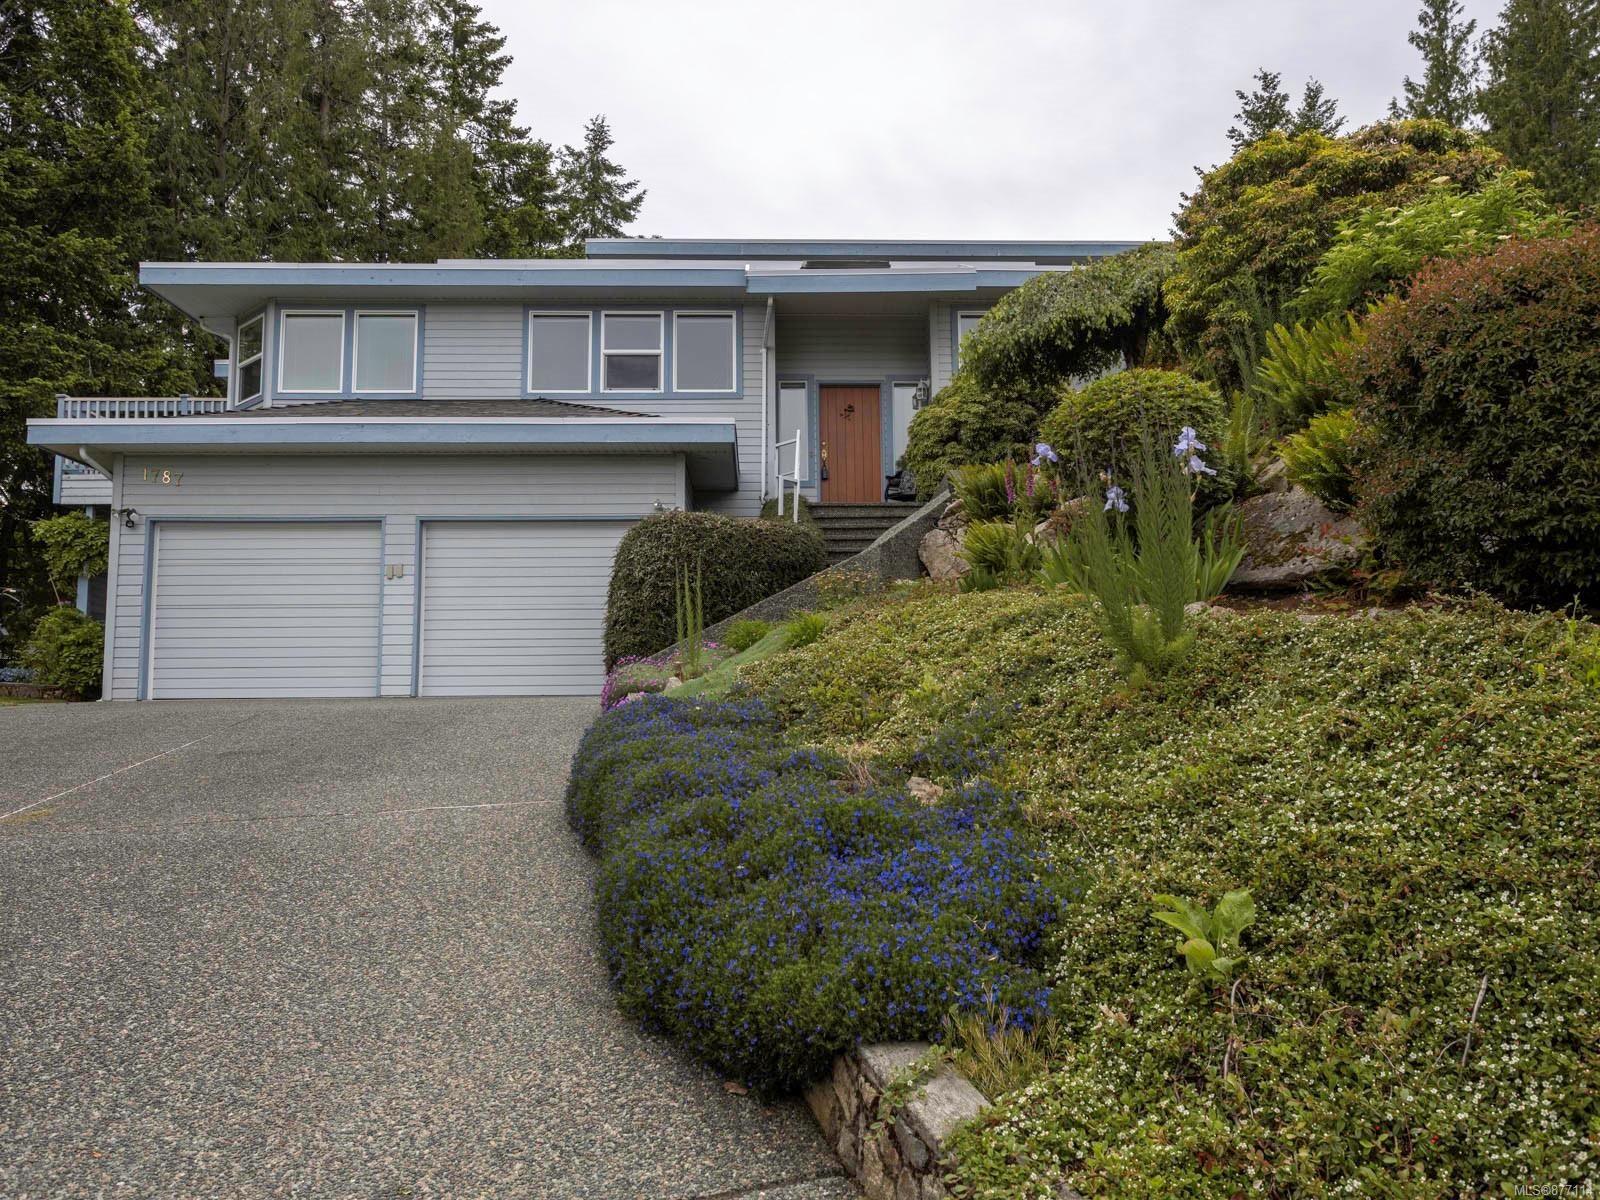 Main Photo: 1787 Fairfax Pl in : NS Dean Park House for sale (North Saanich)  : MLS®# 877114